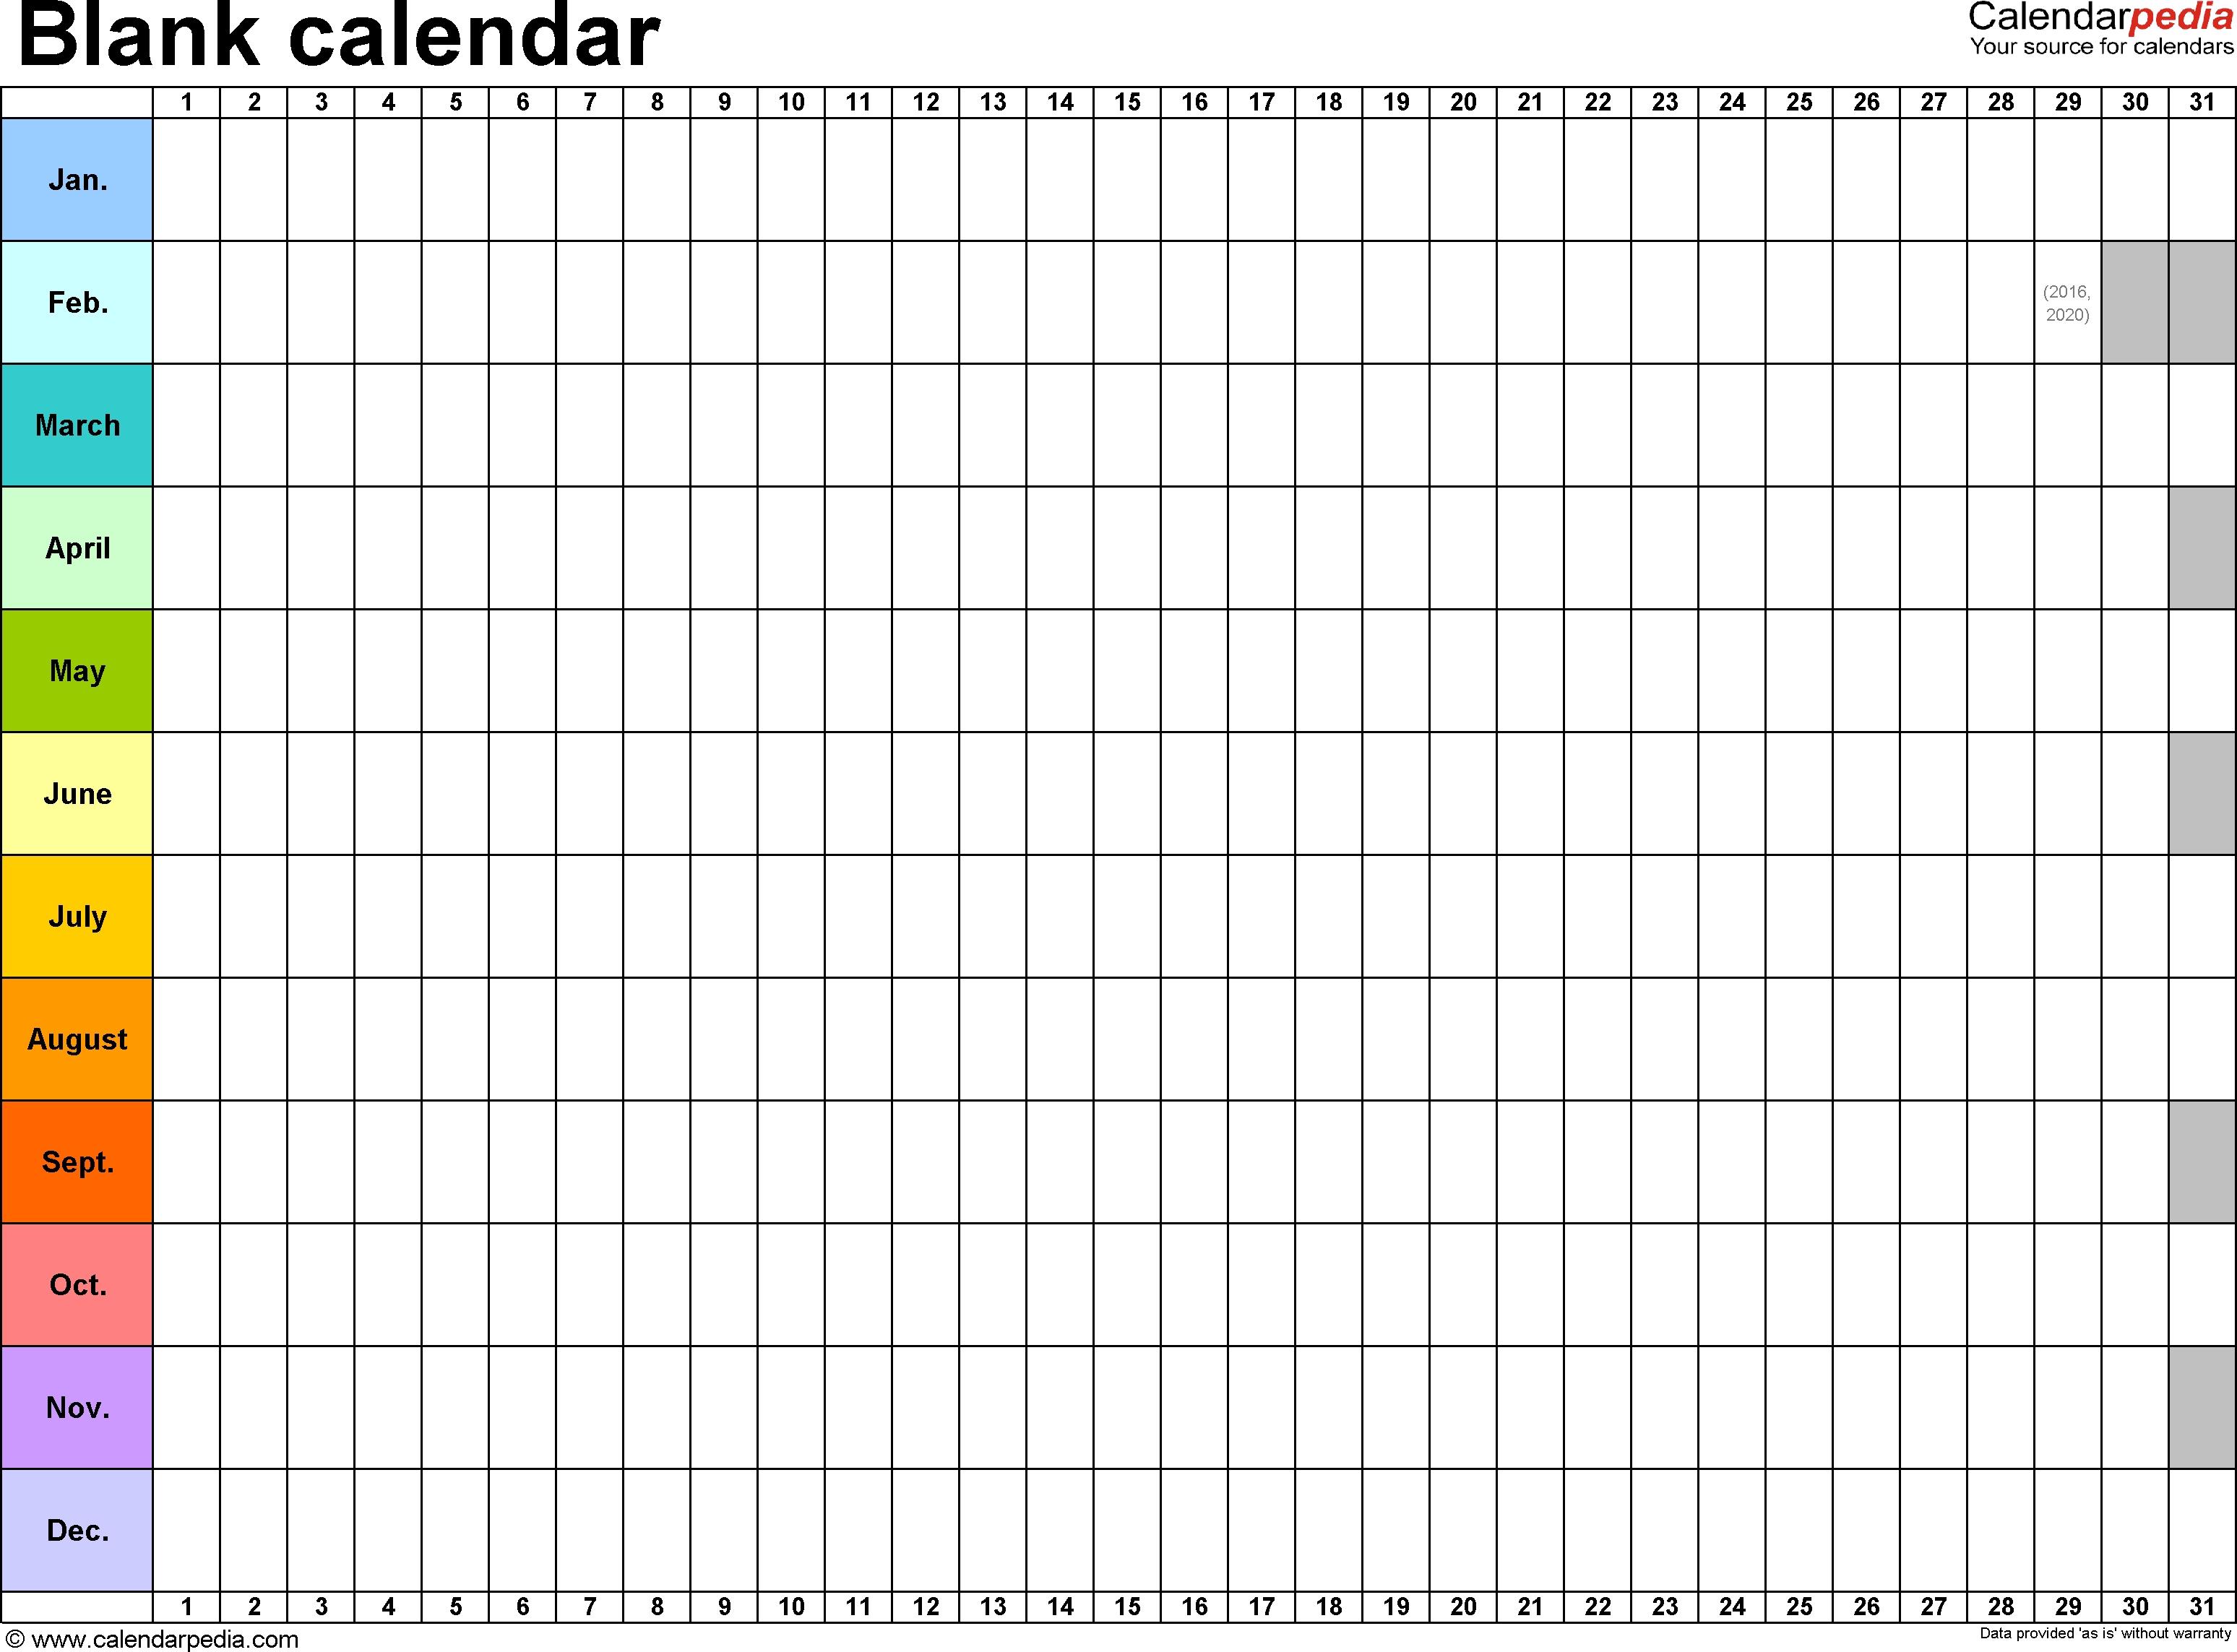 Disd Calendar 2016-2020 Monthly Calendar Template Word • Printable Blank Calendar Template